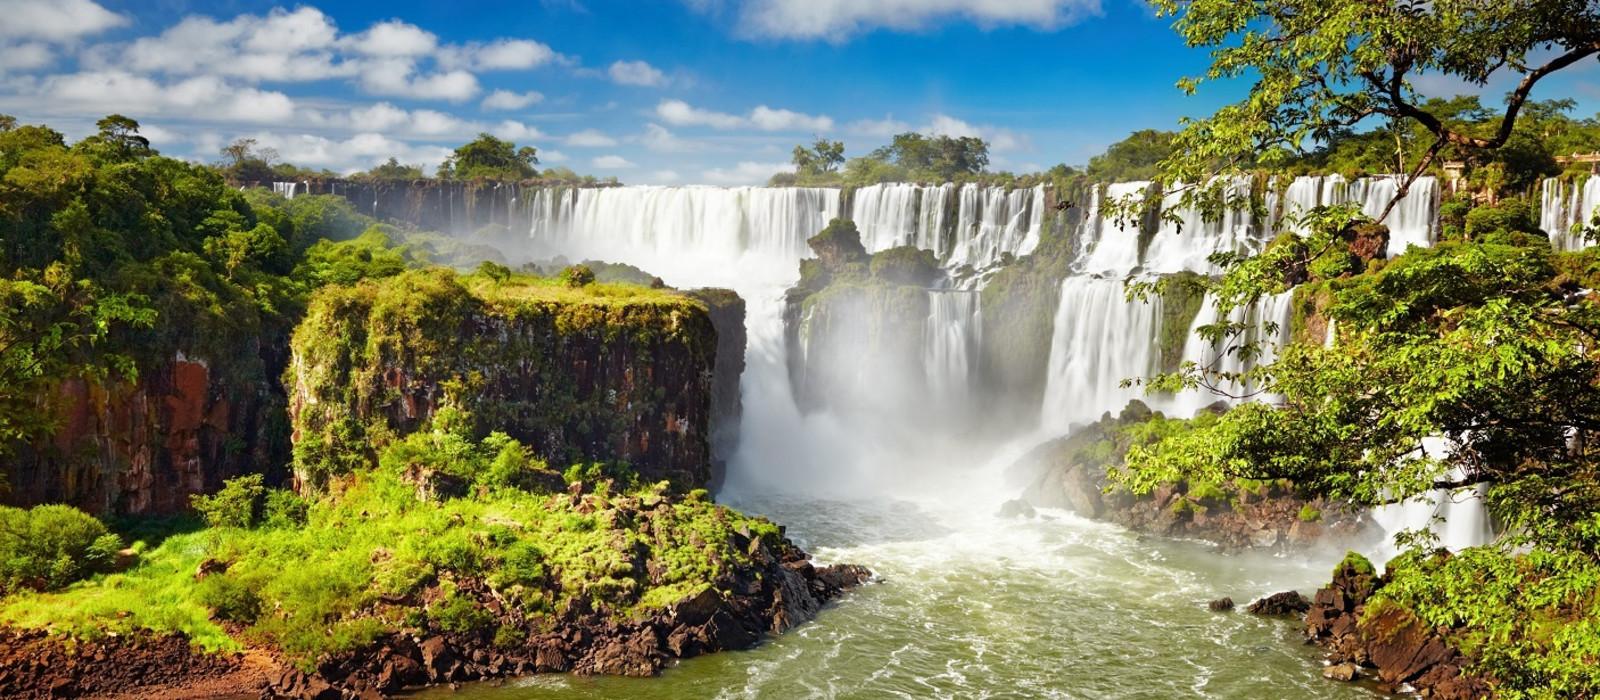 Brazil: Thrilling Waterfalls, Pantanal & The Amazon Tour Trip 1